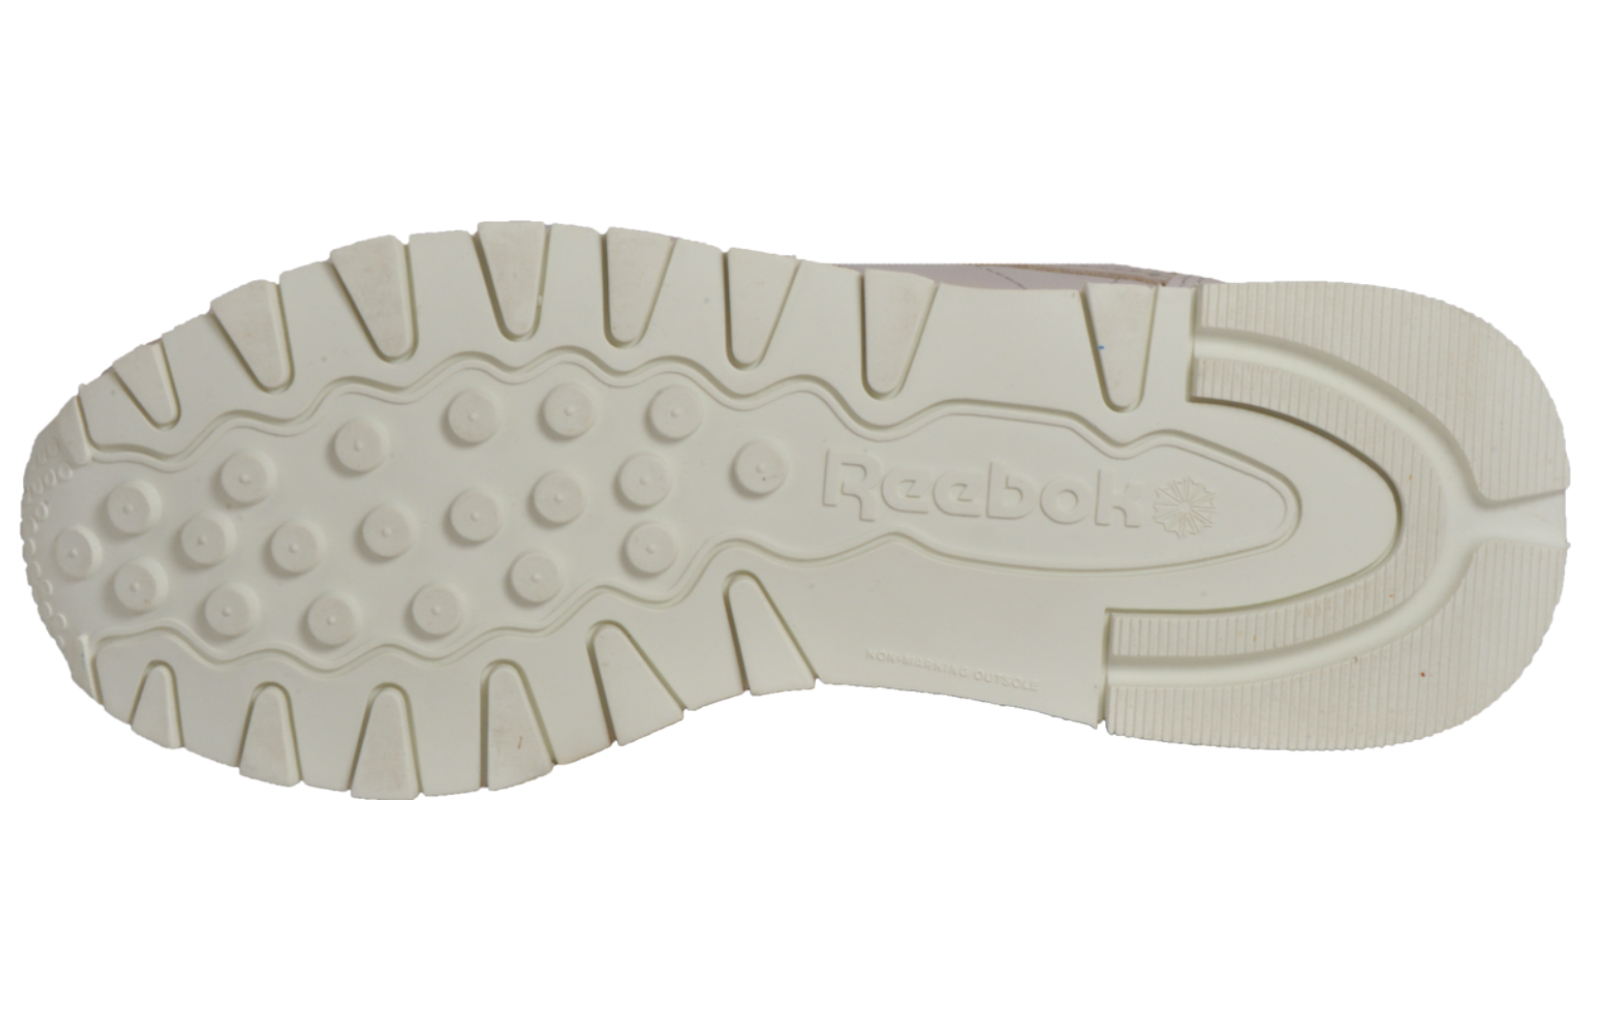 b08e99c3ccb Reebok Classic Leather MN Women s Trainers Sandstone